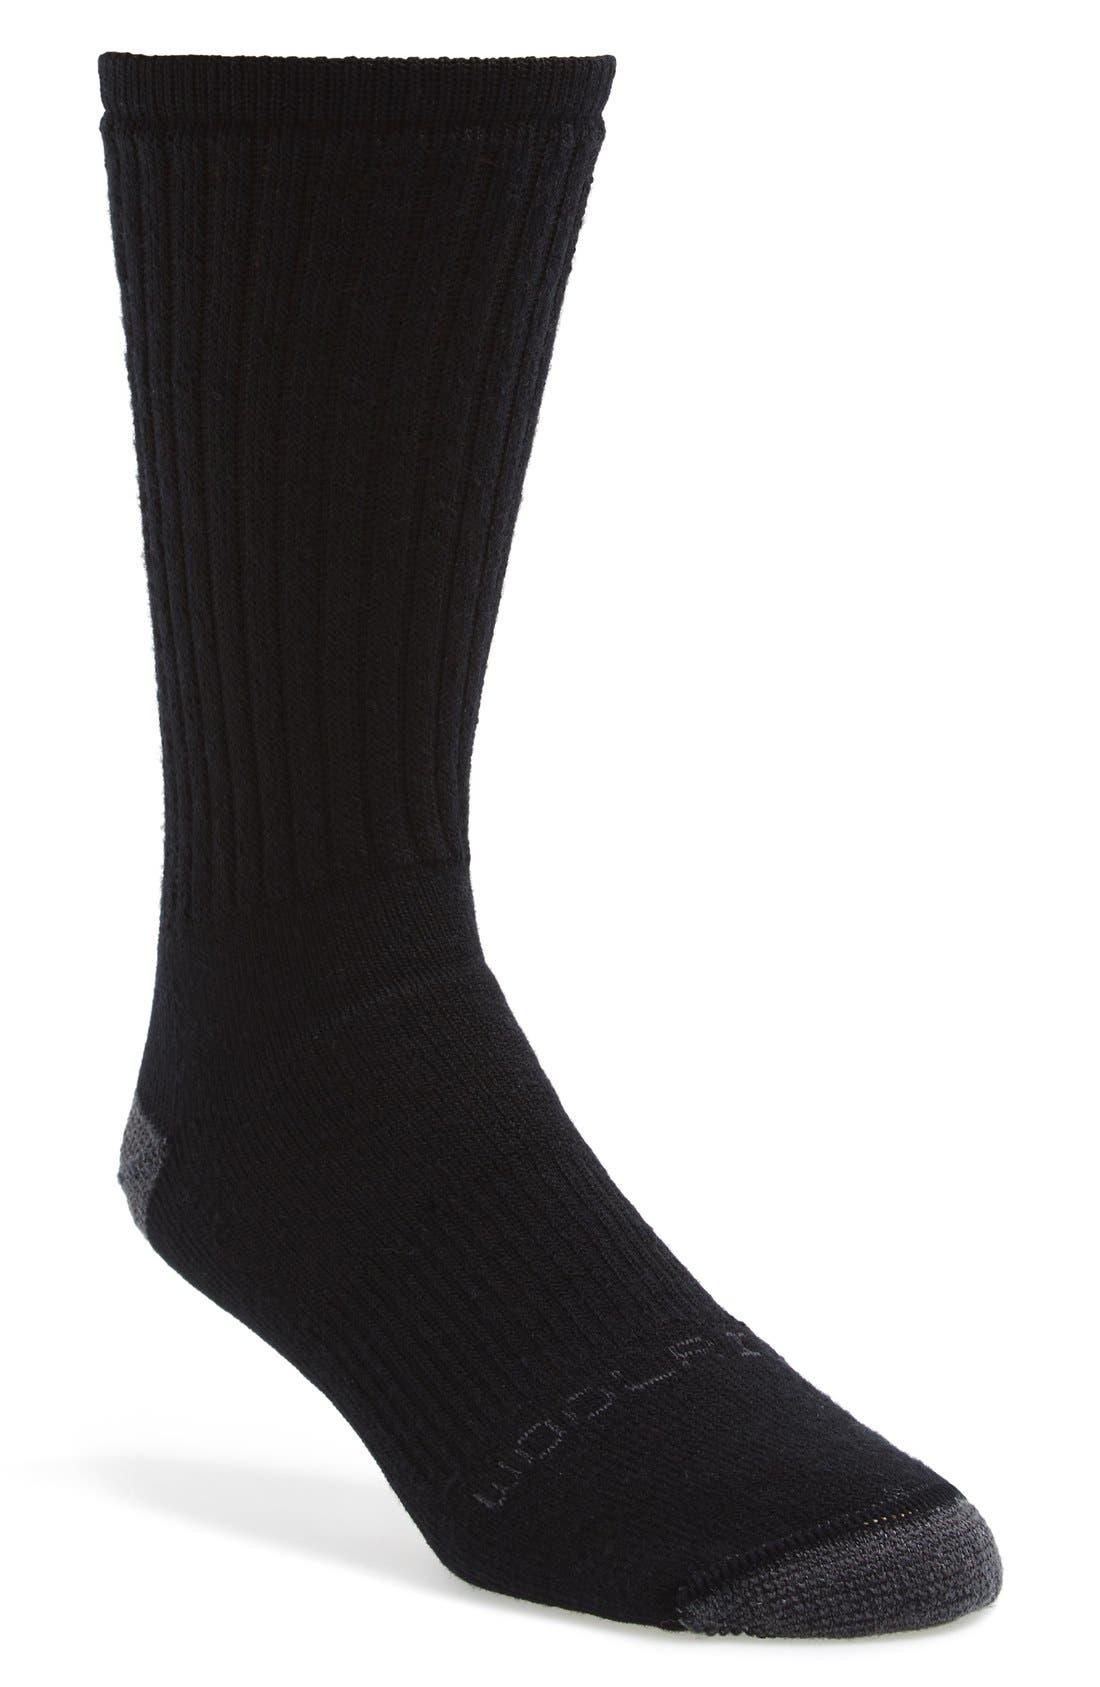 'Ten Mile Hiker' Merino Wool Blend Crew Socks, Main, color, 001